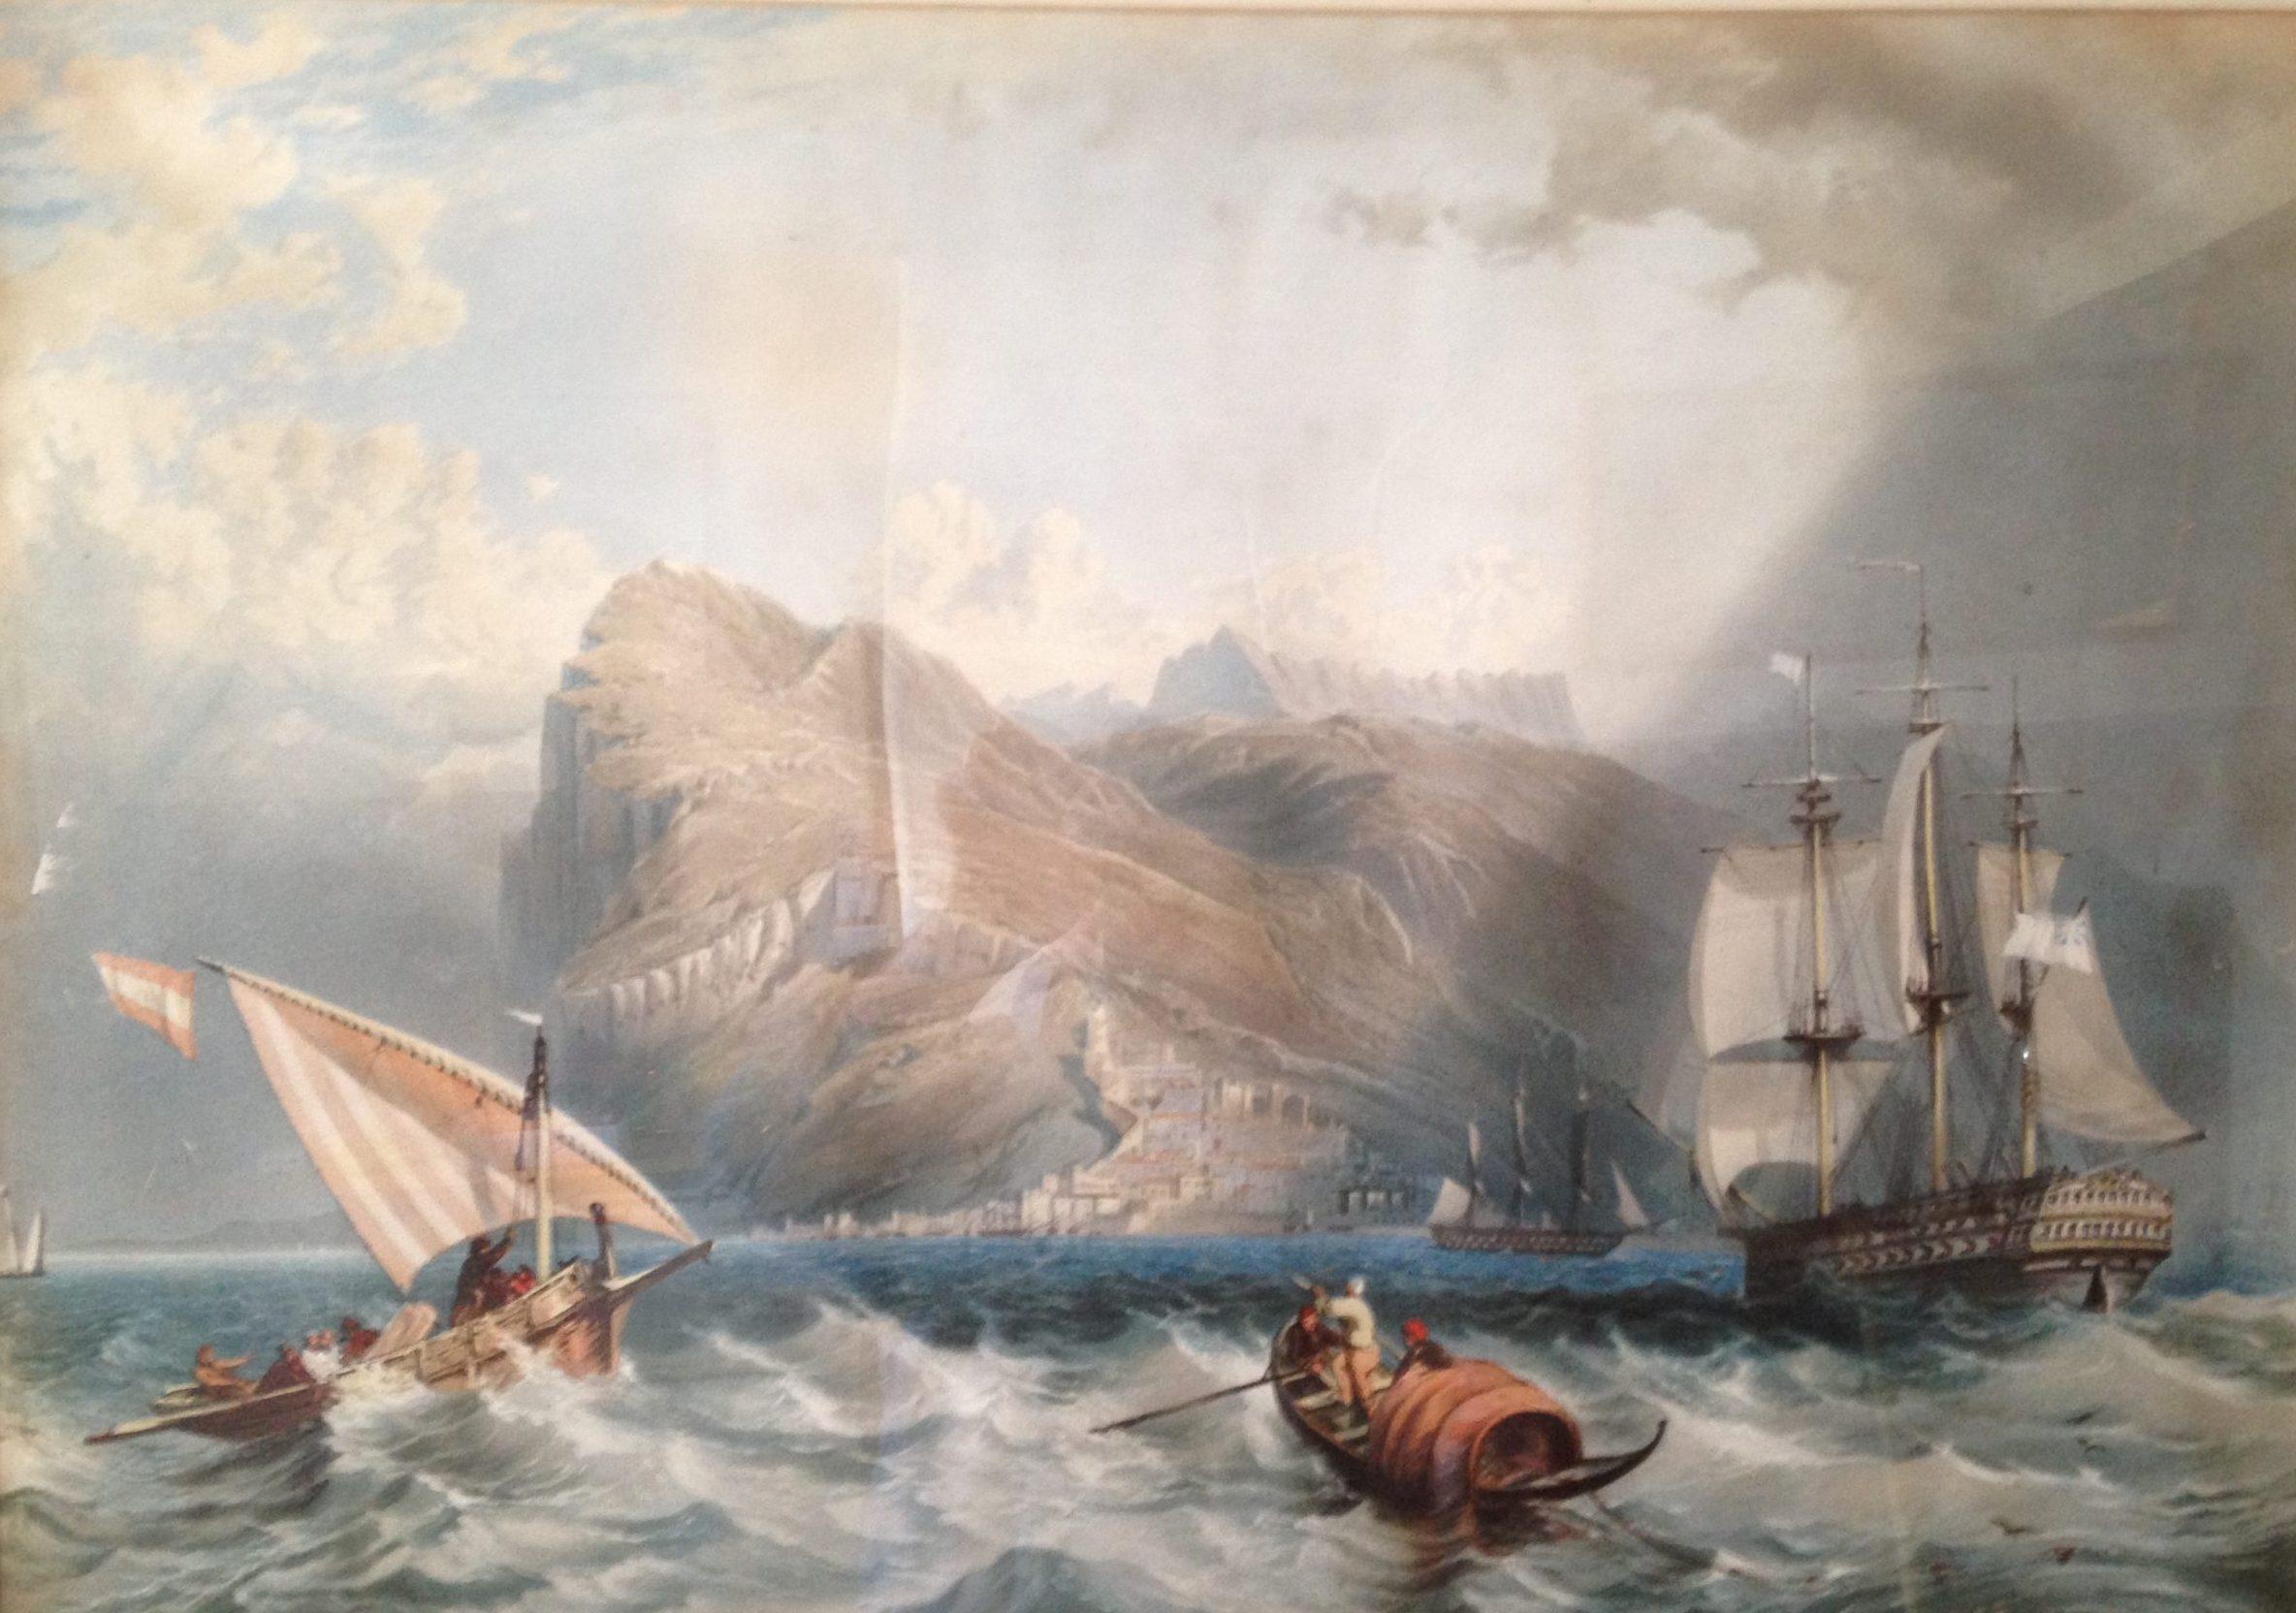 18th Century shipping battling a sharp squall